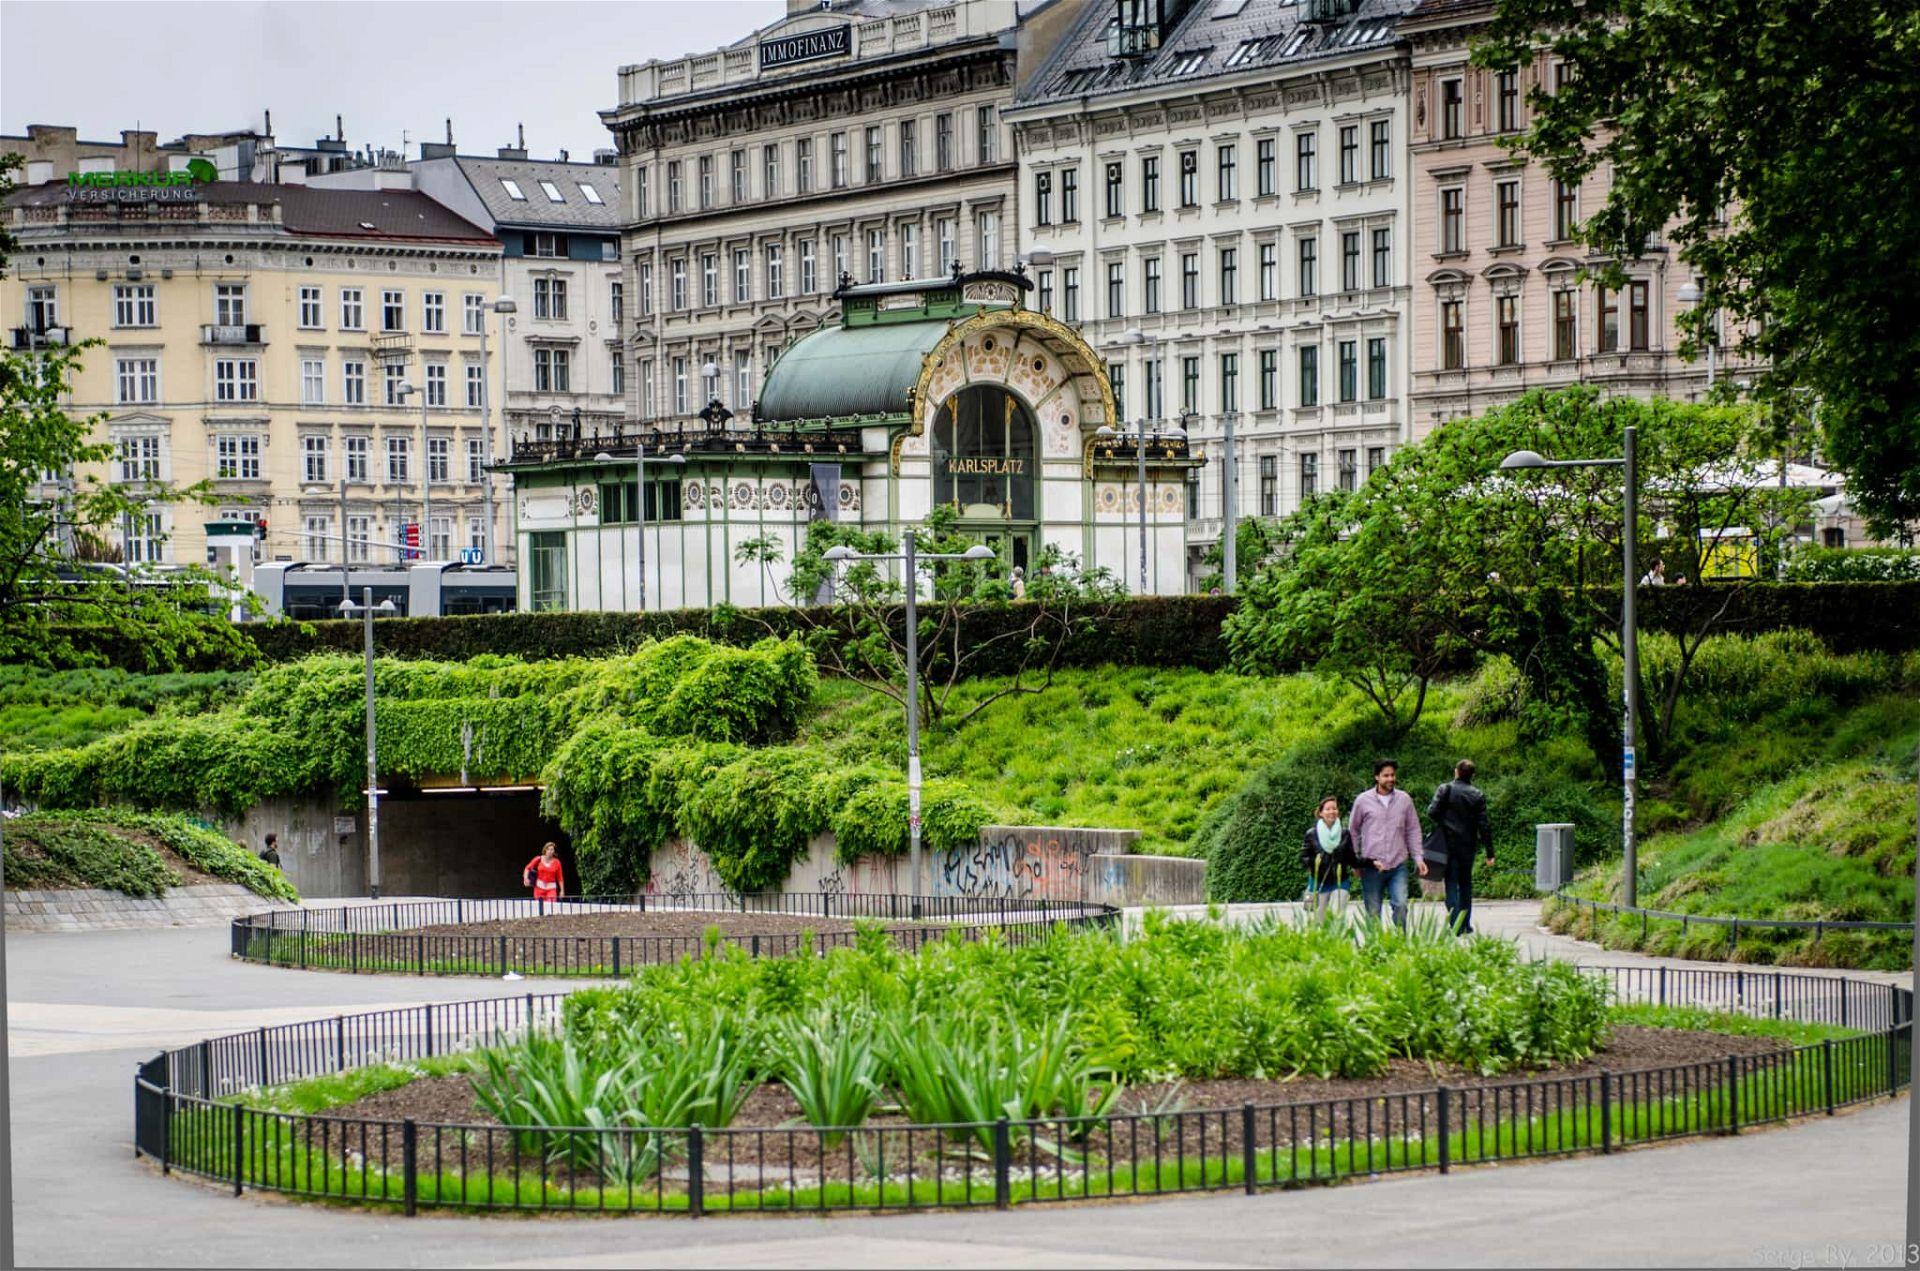 Karlsplatz Station Resselpark